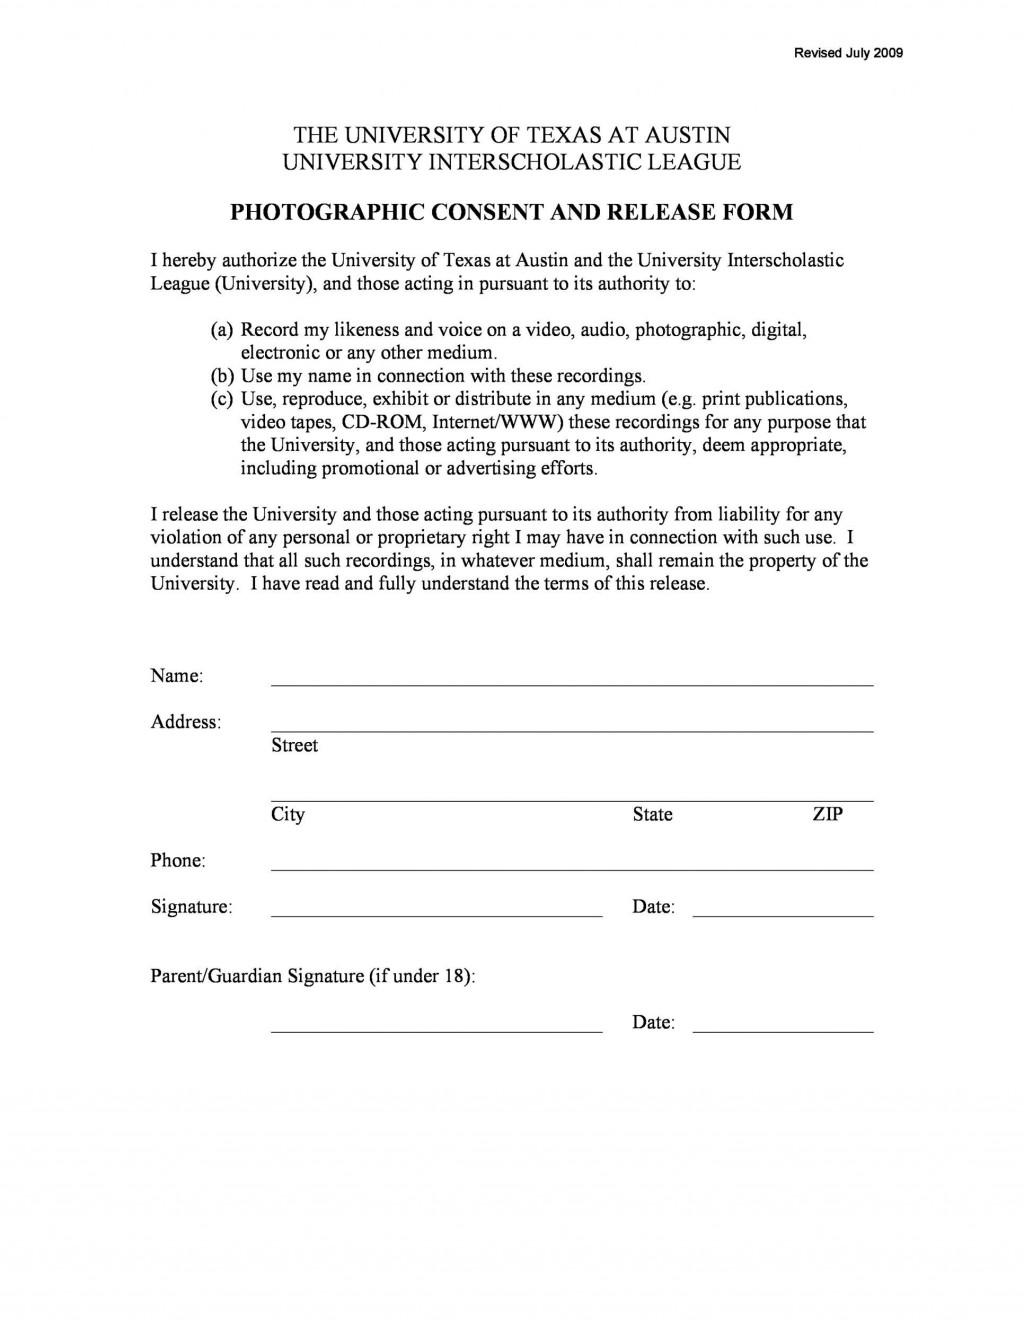 007 Singular Photo Release Form Template Idea  Video Consent Australia Free AndLarge